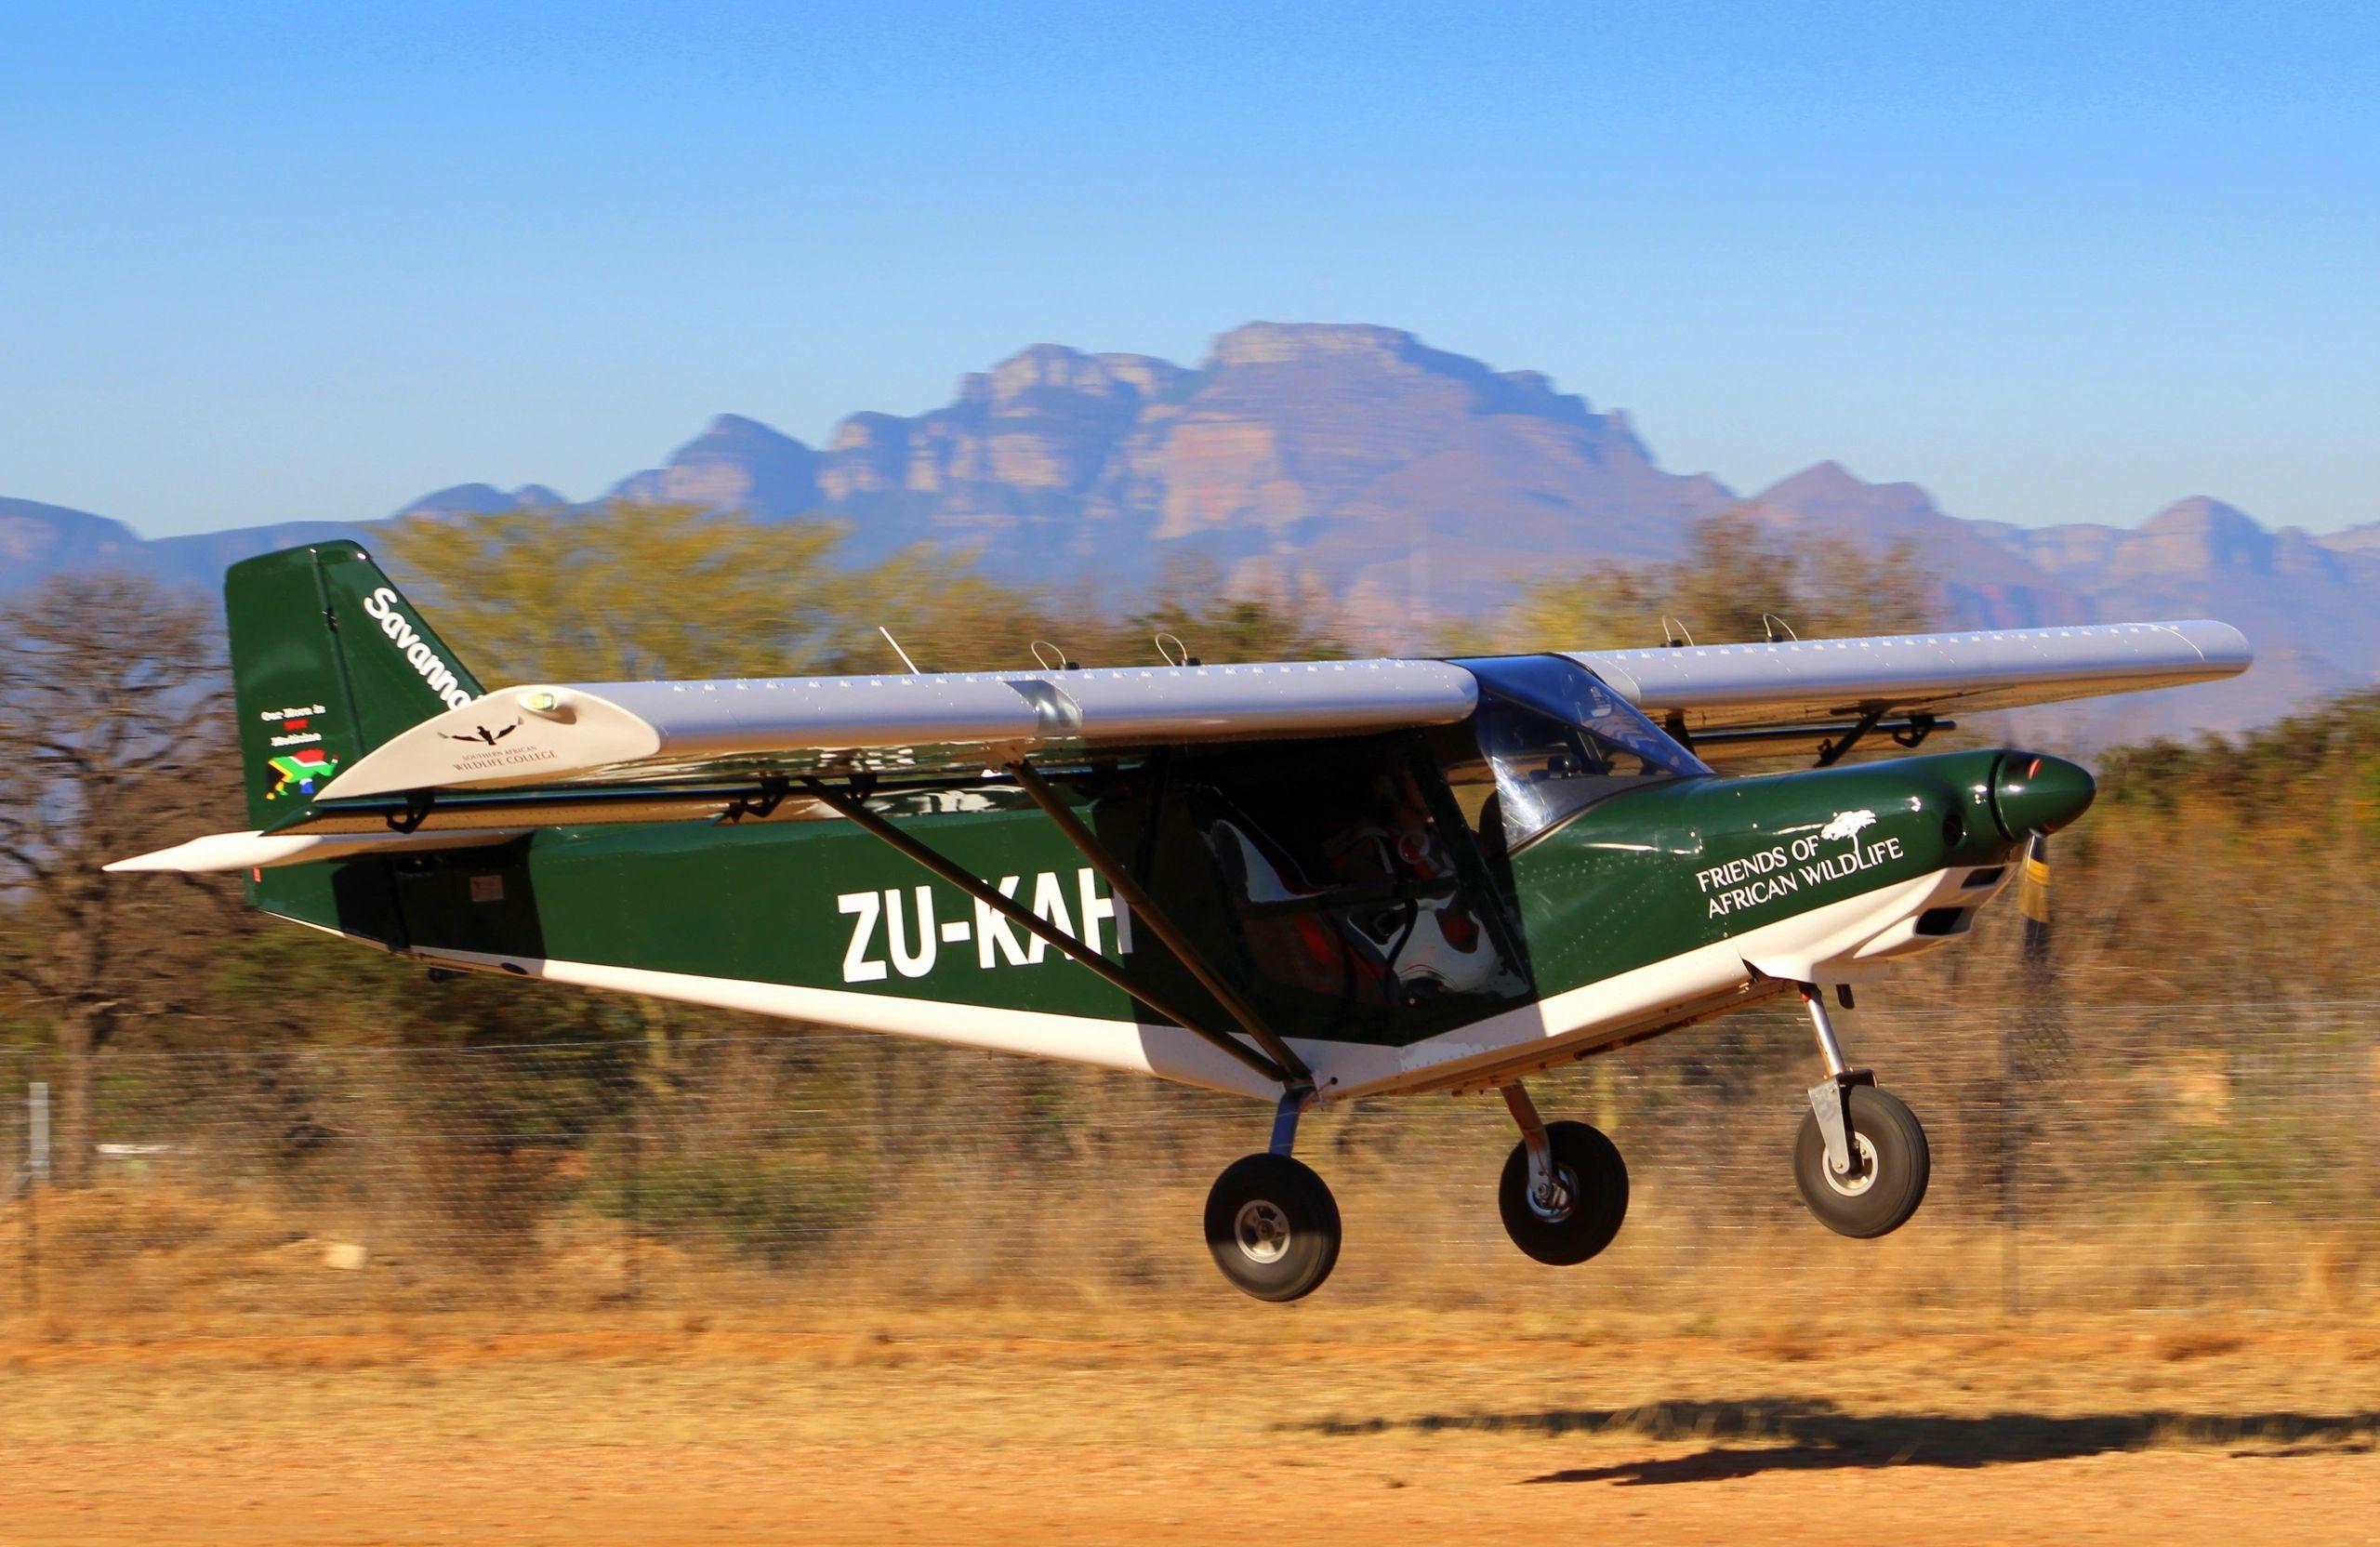 Savannah Aircraft - Savannah Aircraft Africa | Savannah